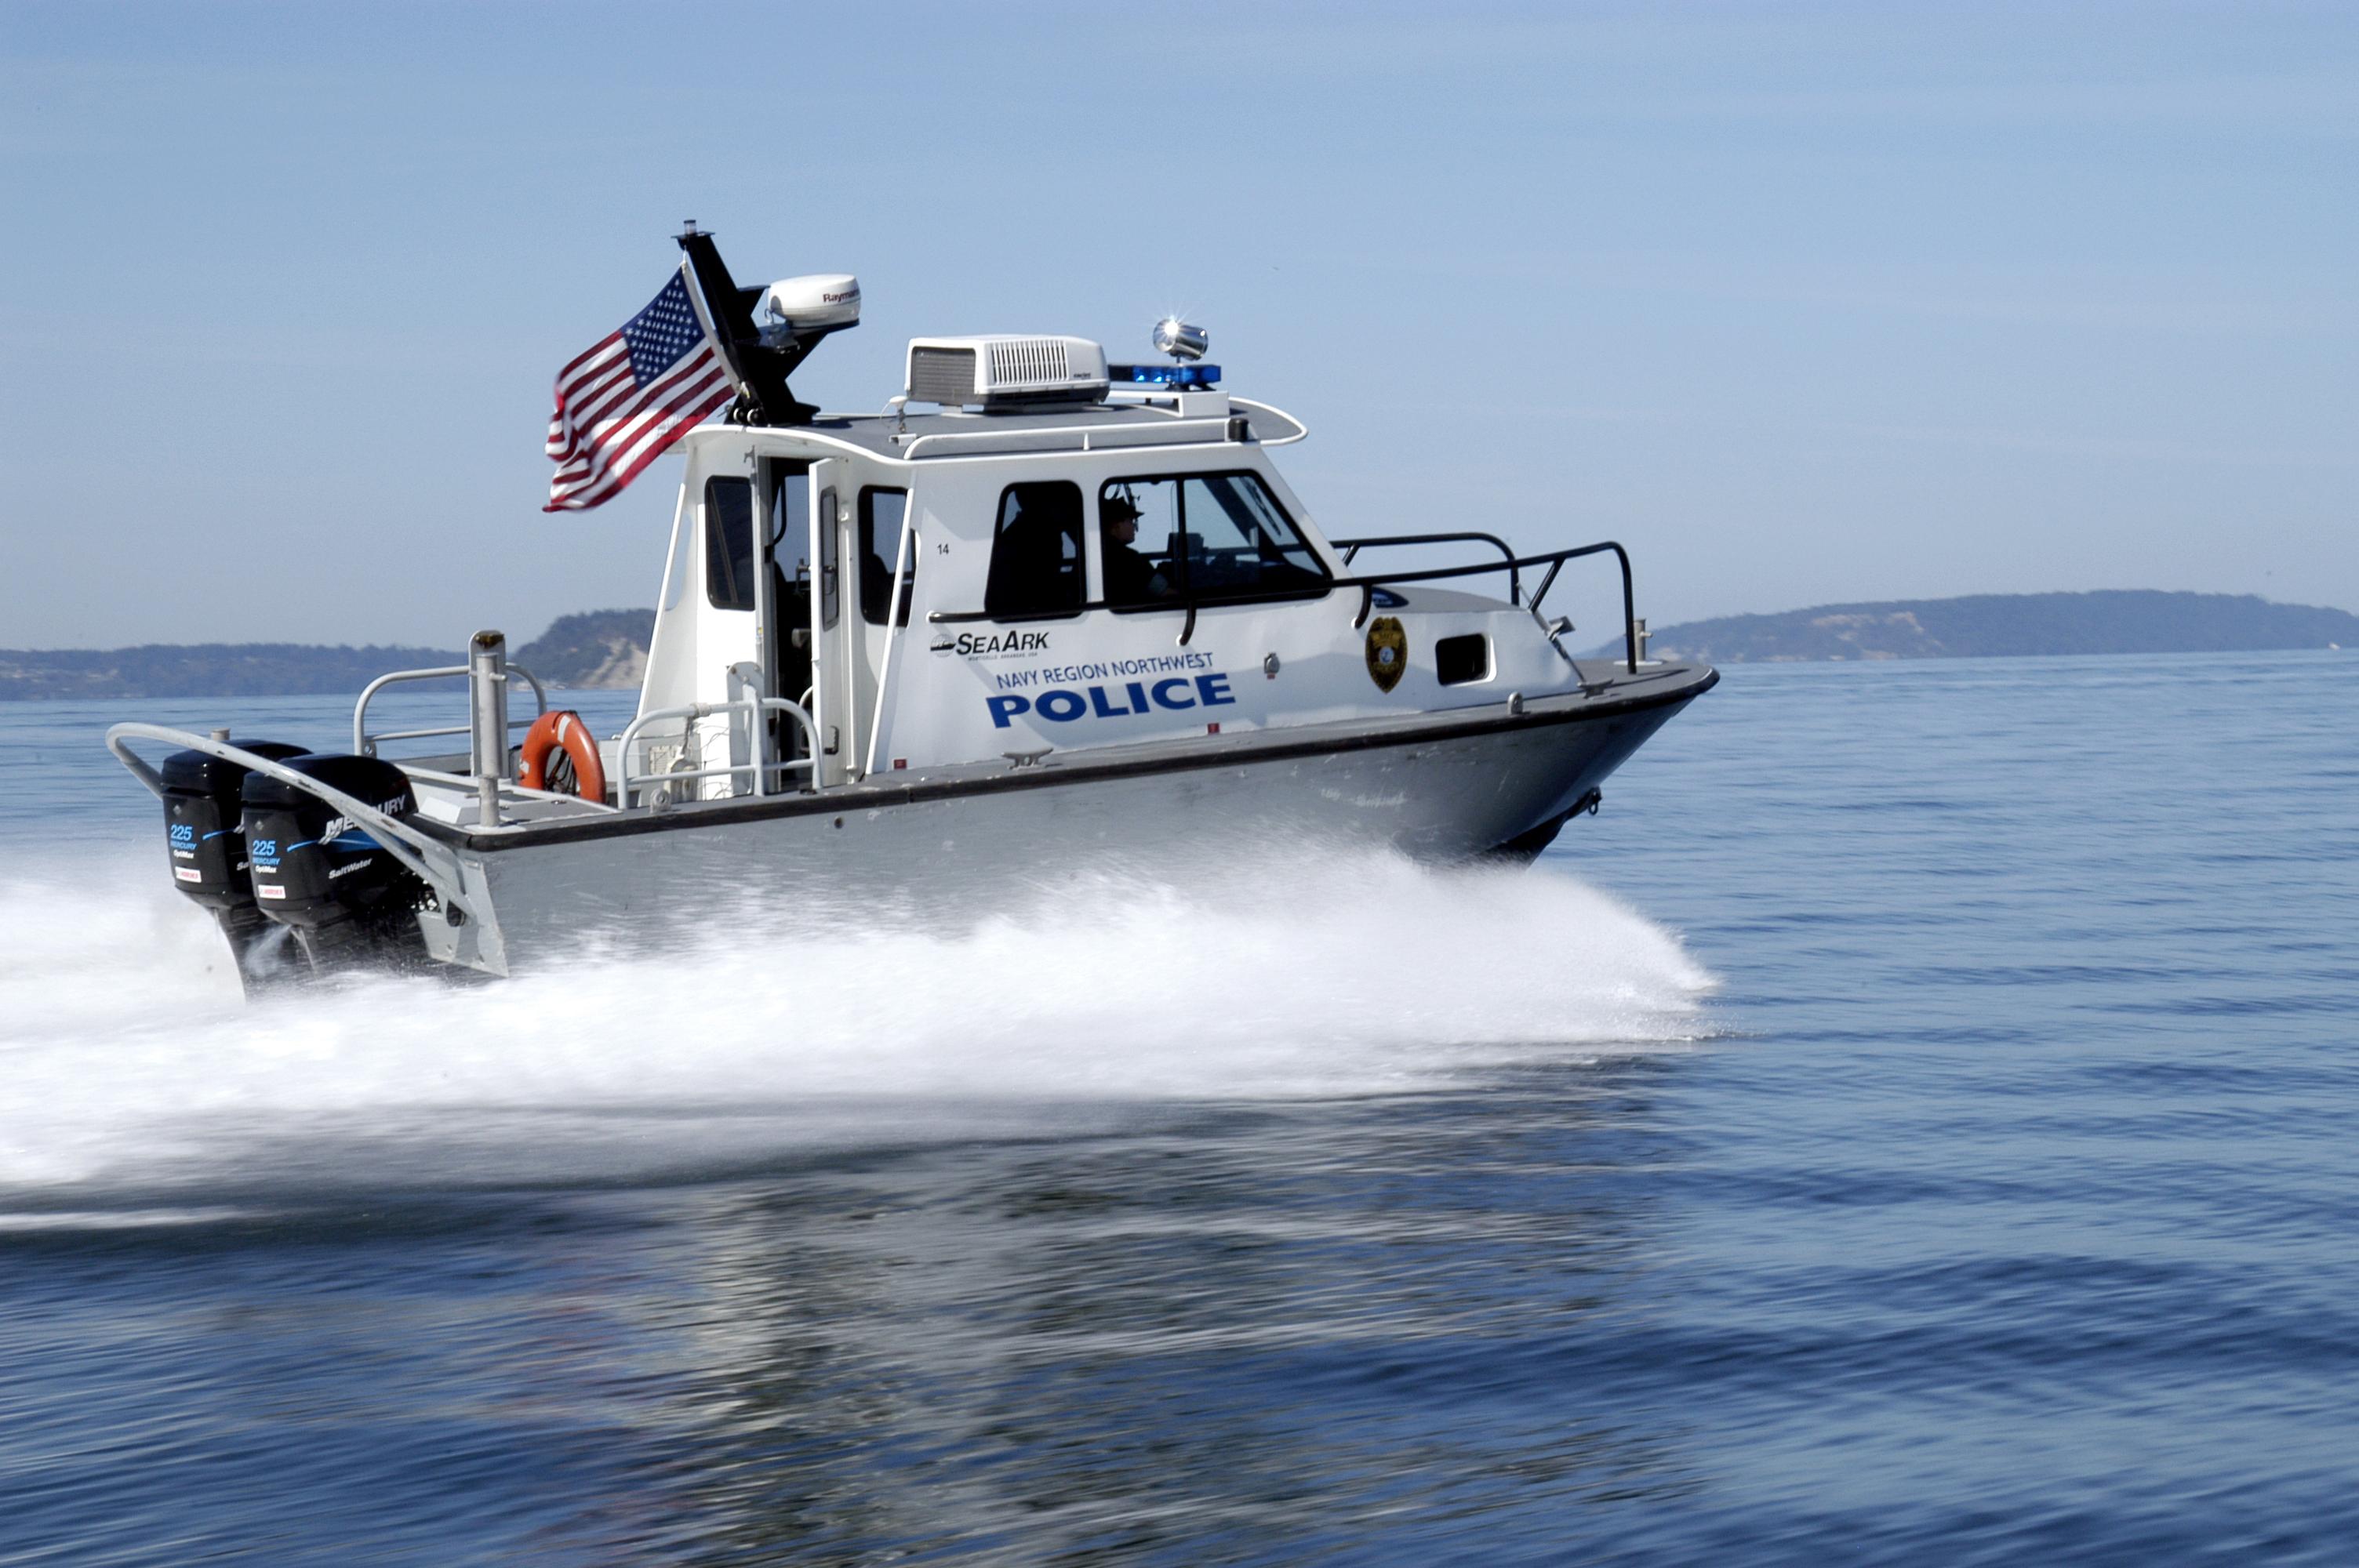 File:US Navy 040907-N-0683J-061 A Navy Region Northwest Police ...